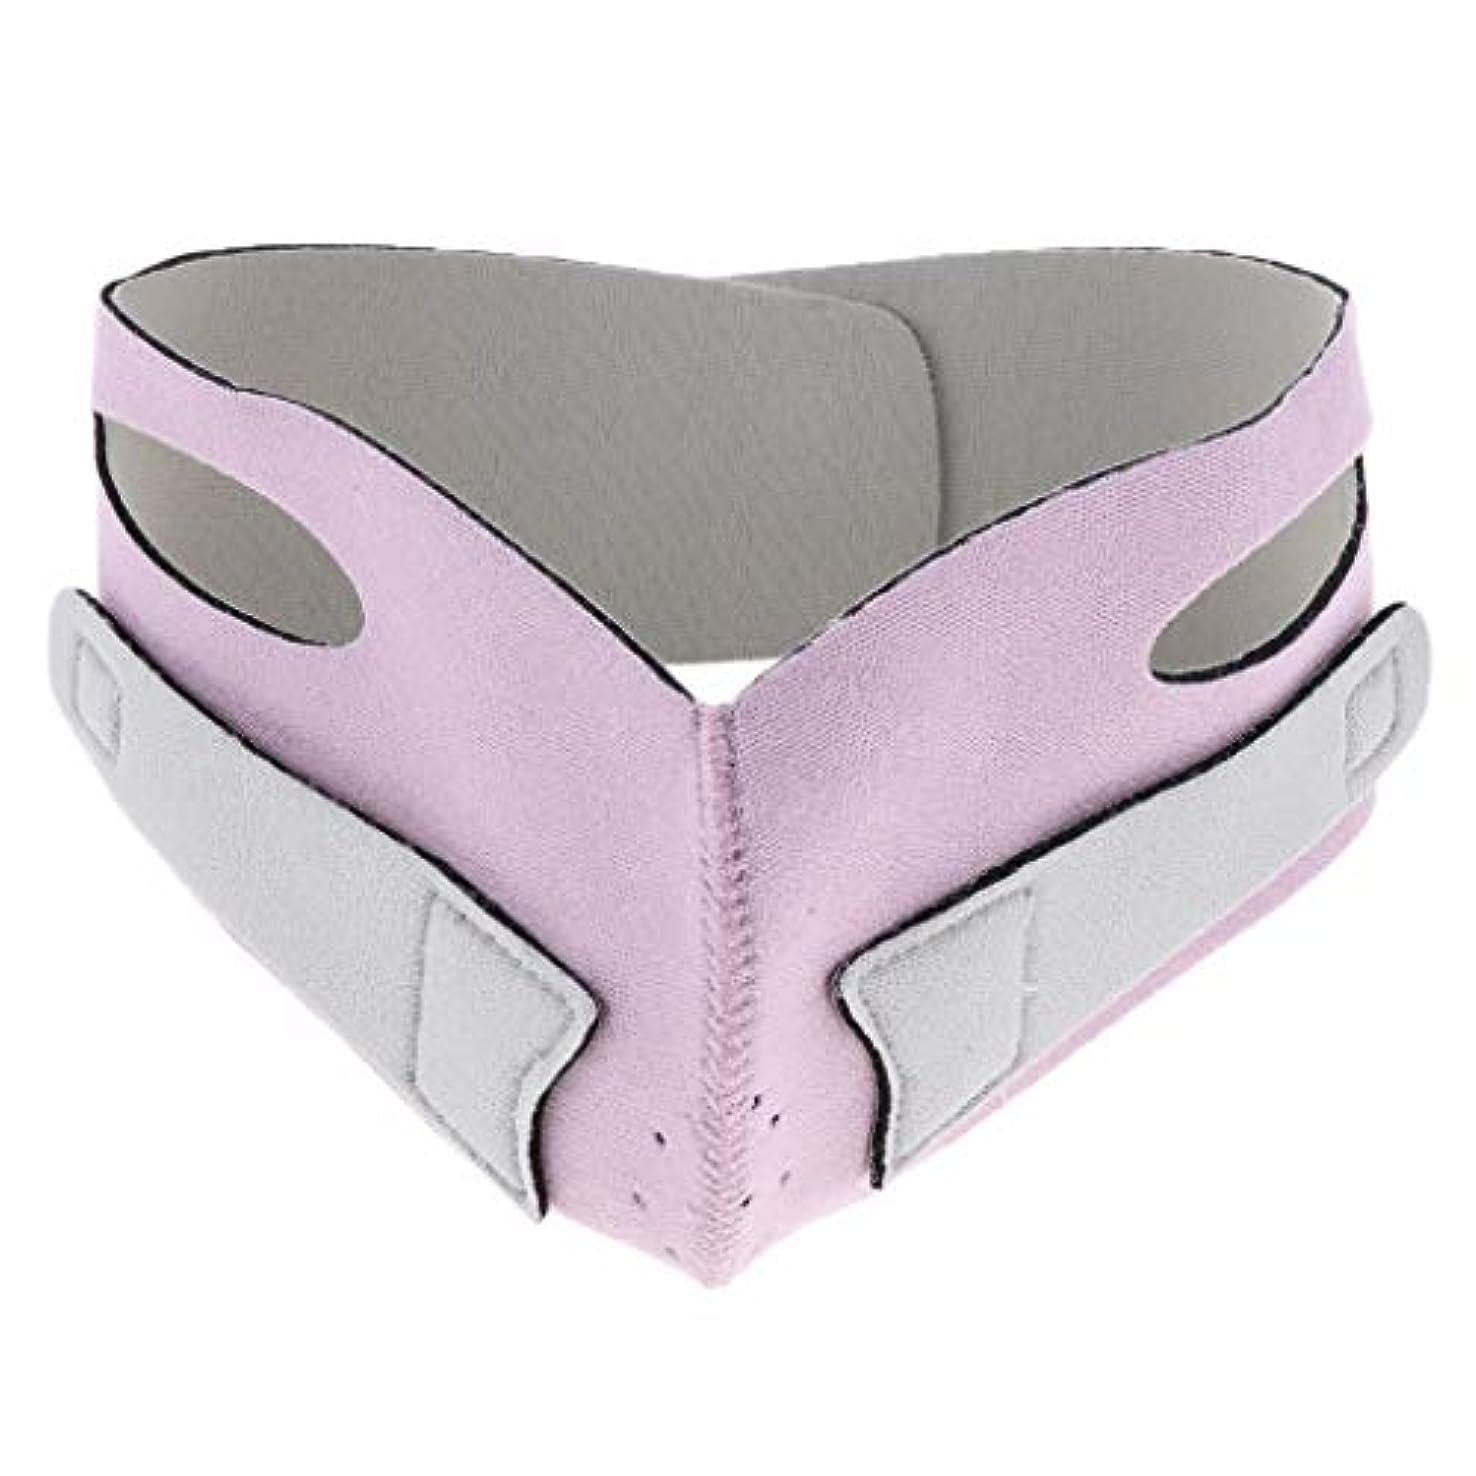 D DOLITY 引き上げマスク 頬リフトアップ V-ラインマスク リフティング リフトスリムマスク 通気性 全2色 - ピンク